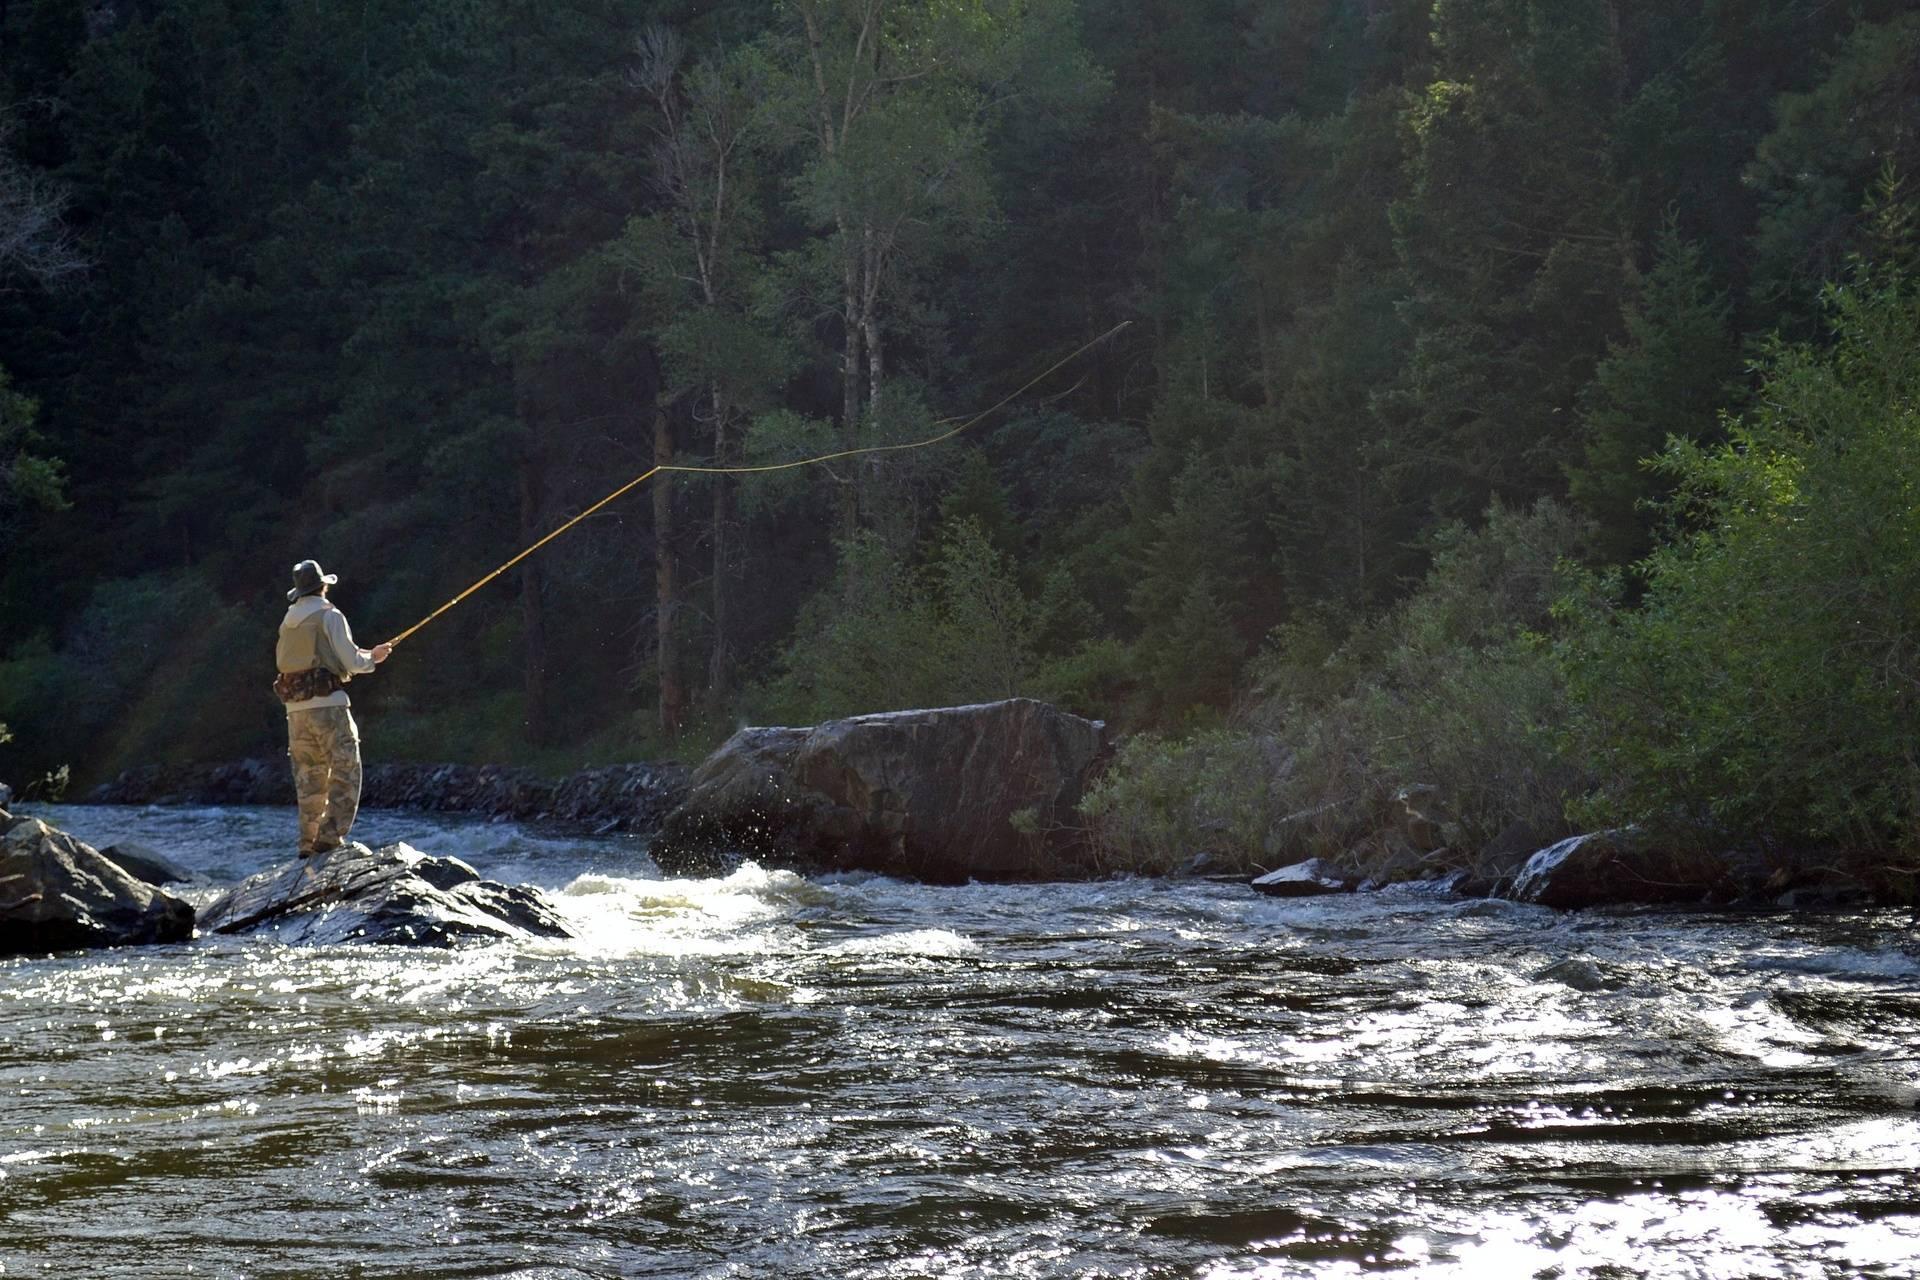 River Casting 2